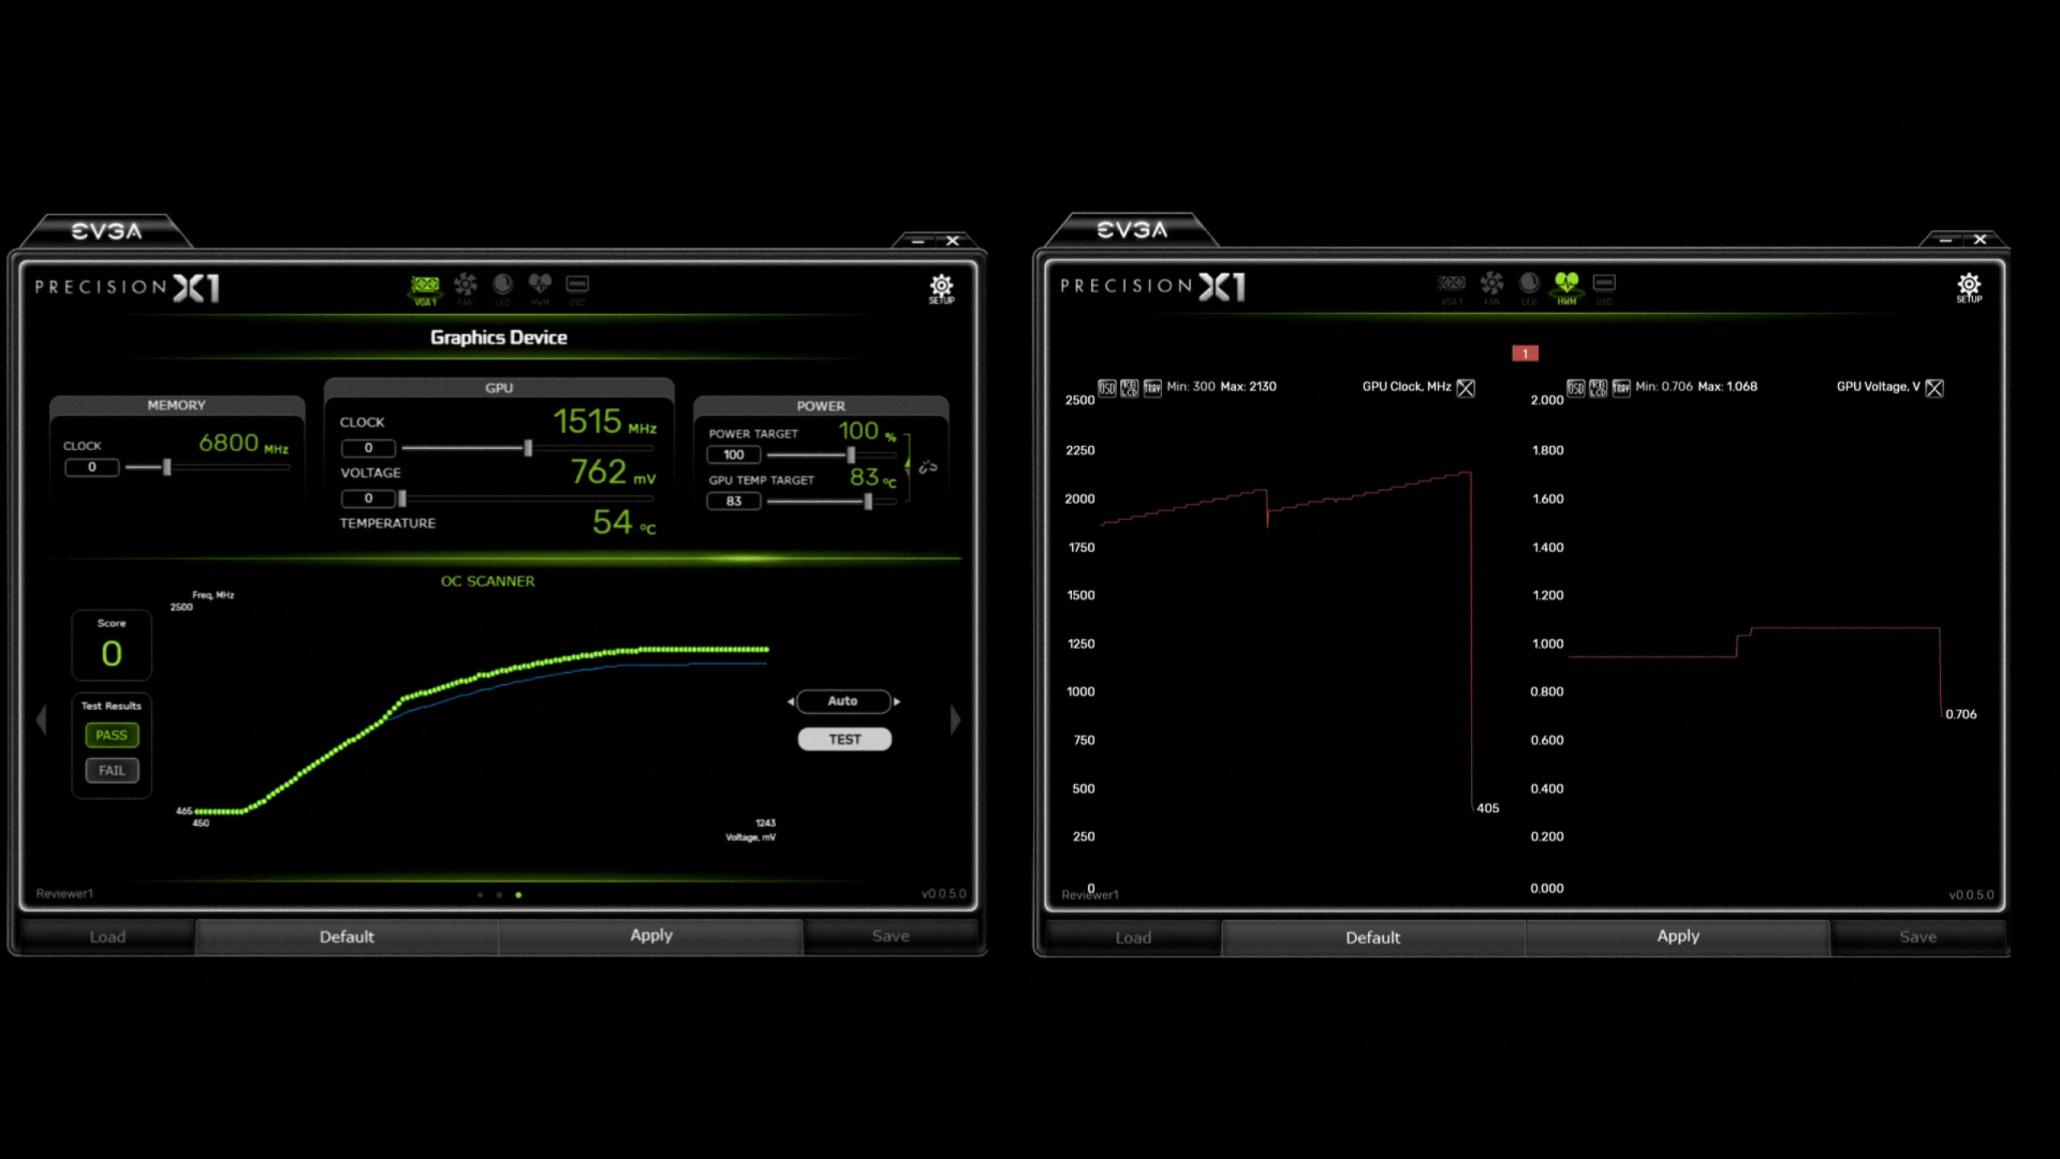 nvidia-geforce-20-series_official_oc-sli_nvidia-scanner_3